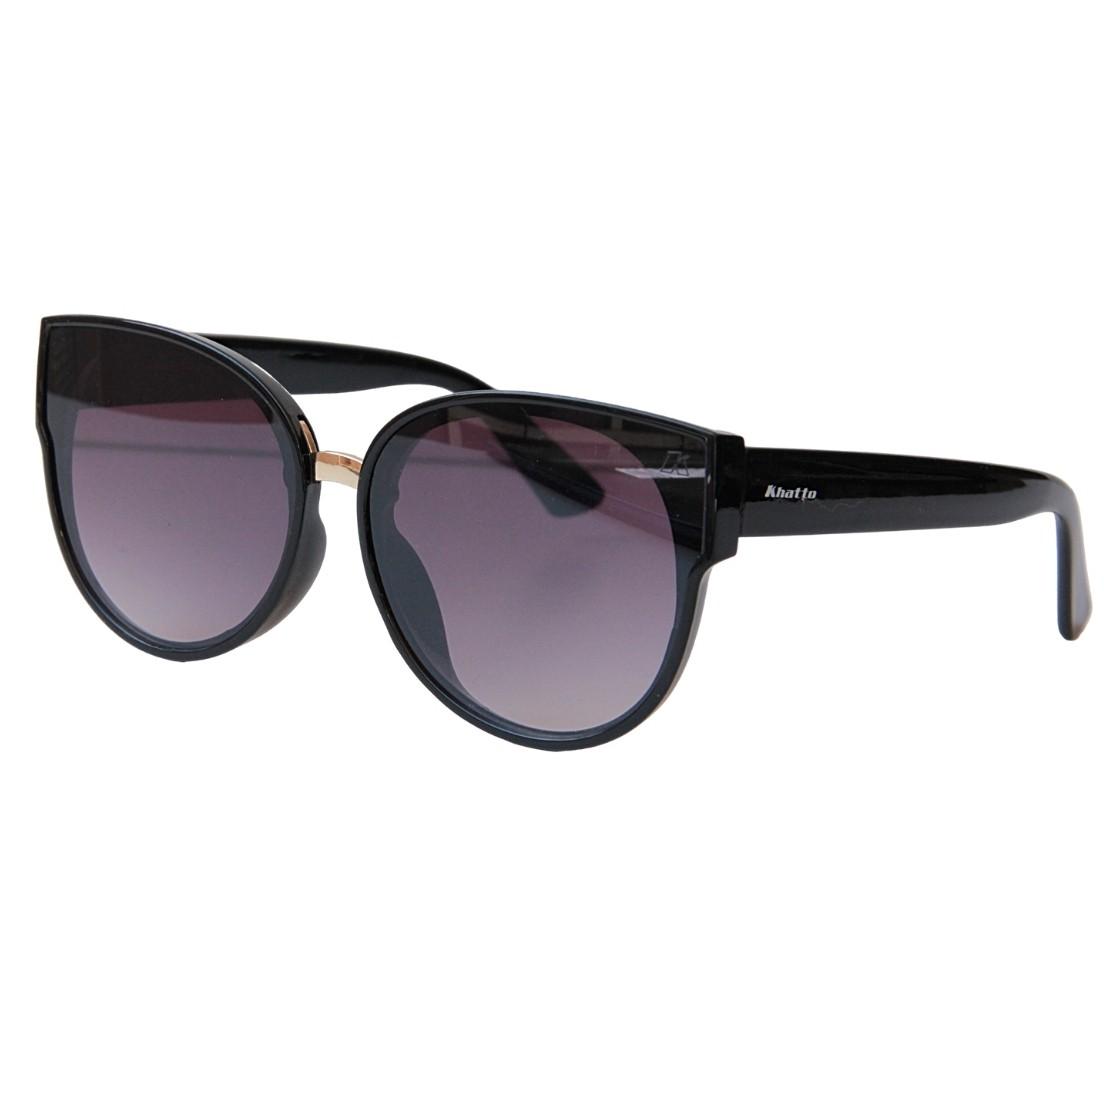 Óculos de Sol Khatto Cat New Space Italiano - PU